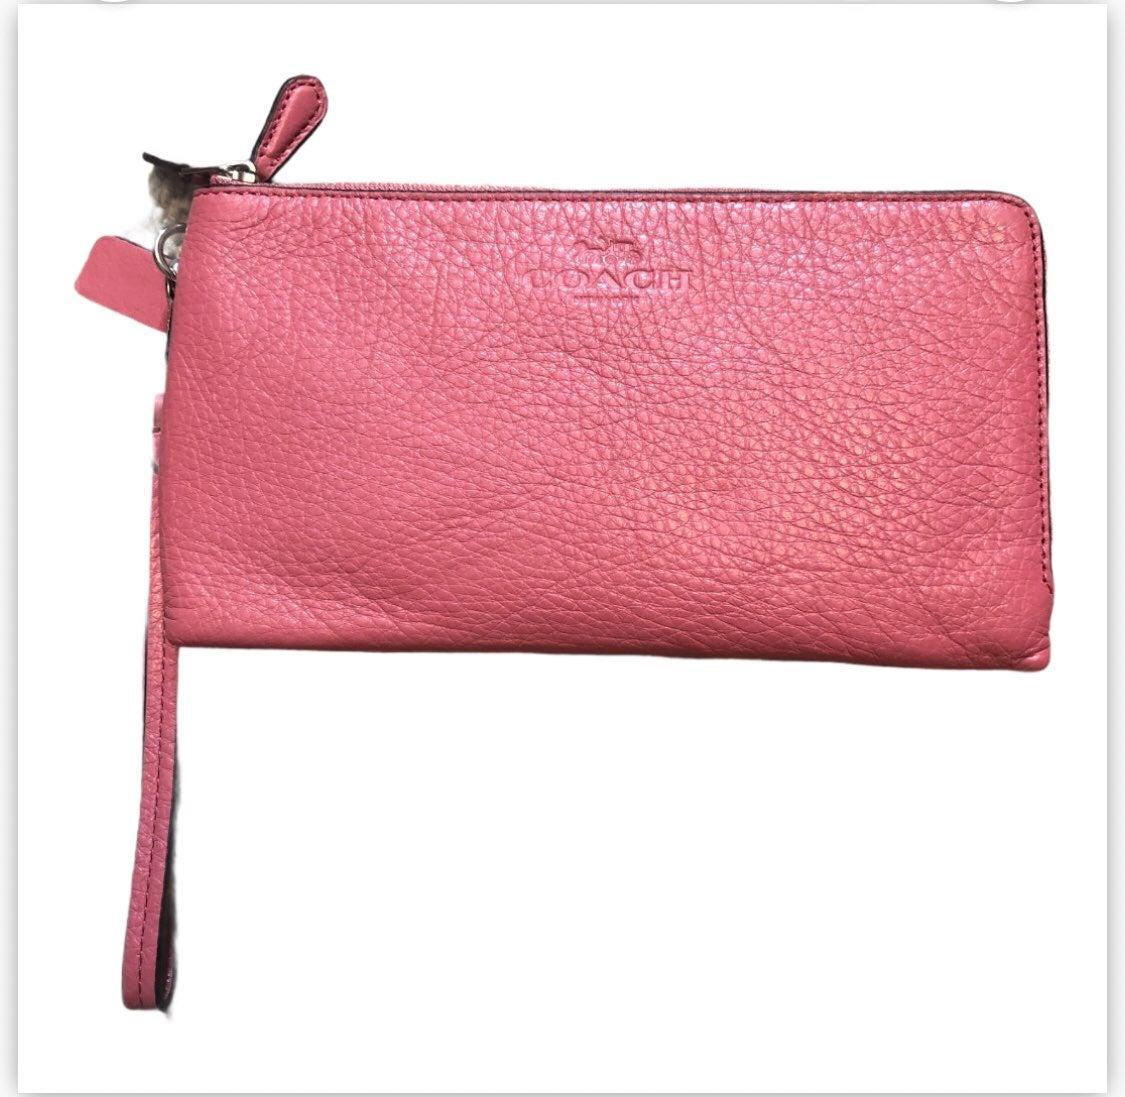 Coach Pink Double Zip Wristlet